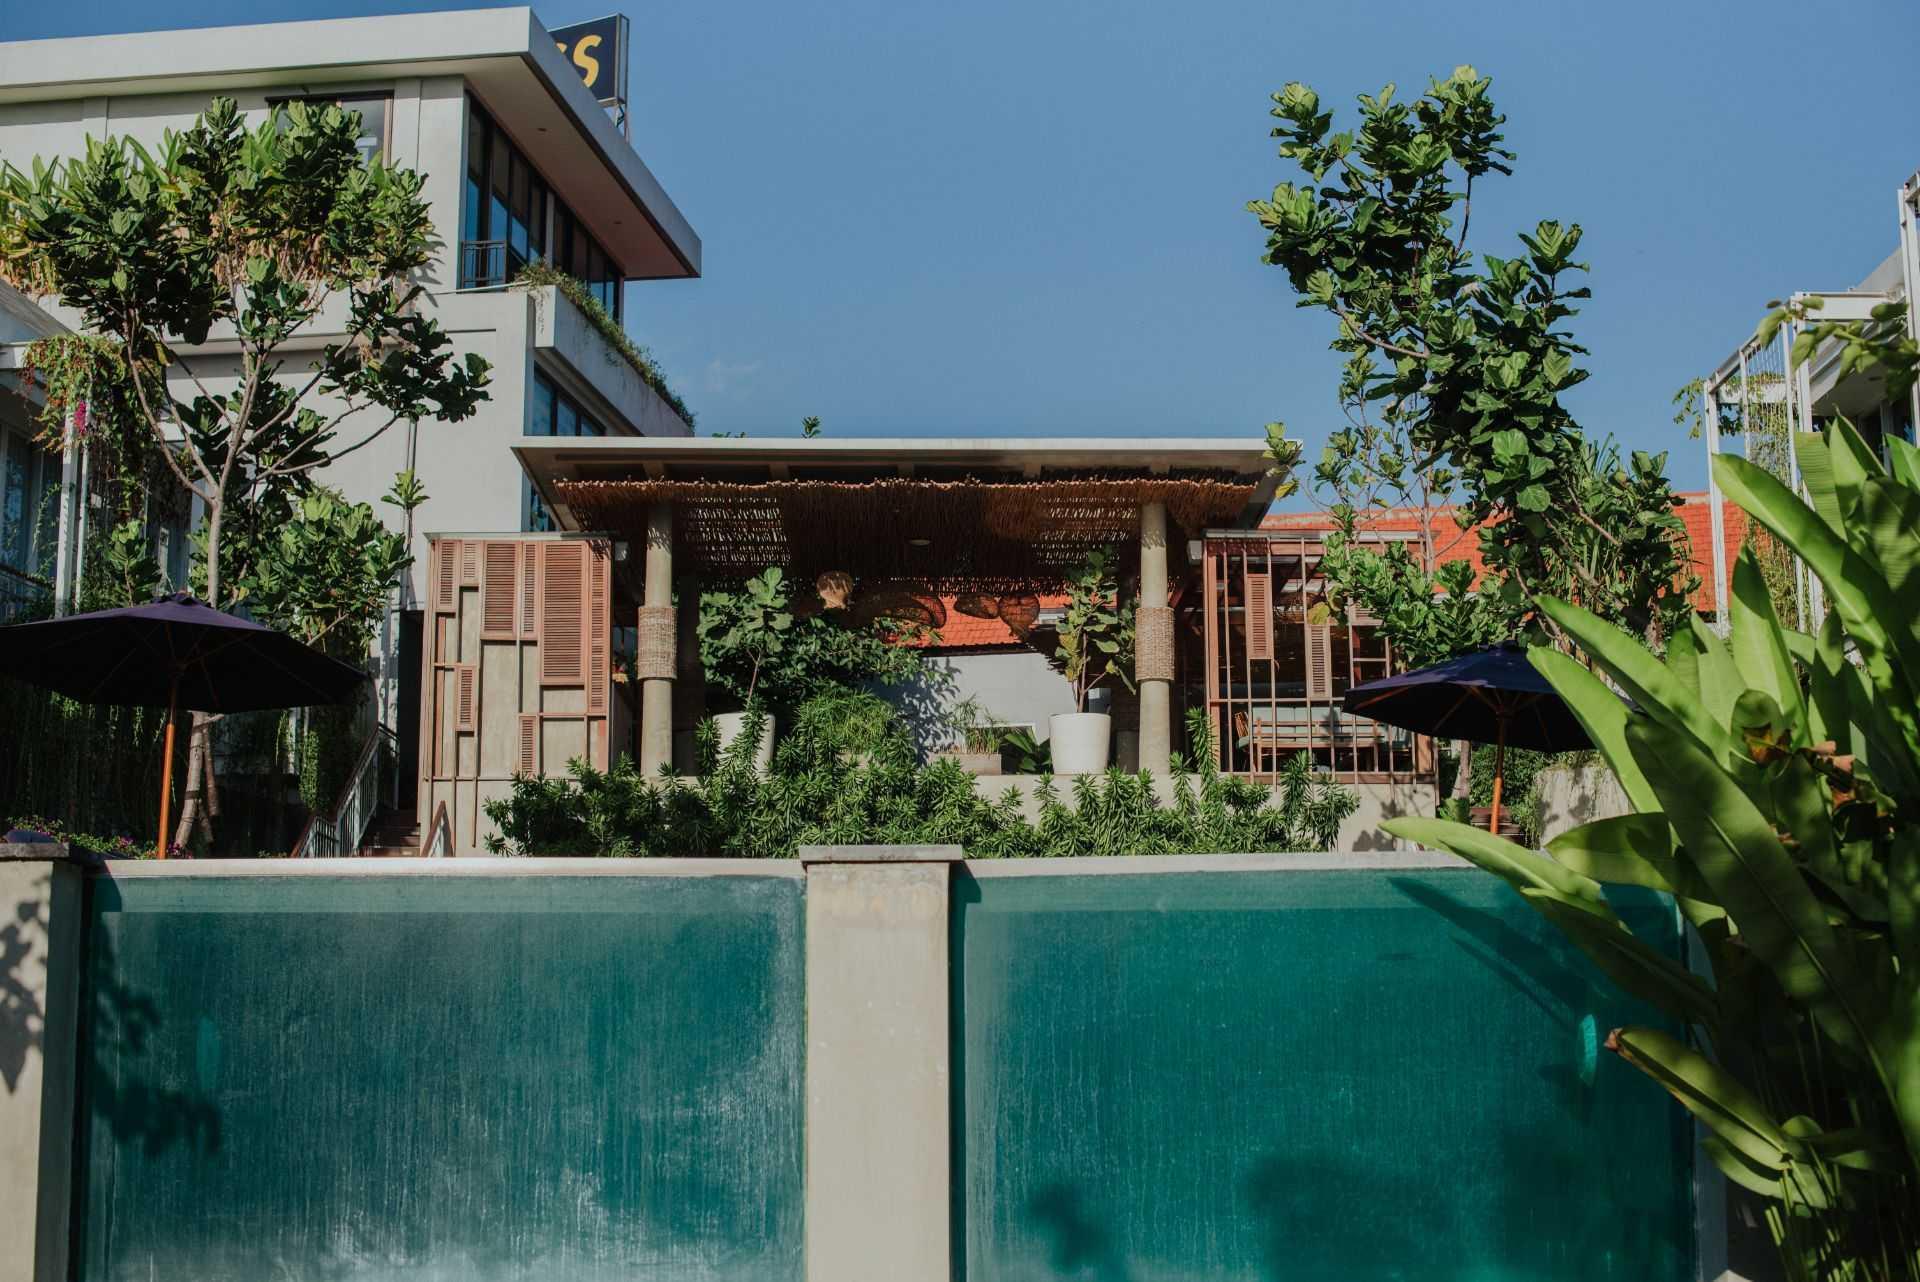 Nitkala Arsitek Rimbun Hotel Canggu, Kec. Kuta Utara, Kabupaten Badung, Bali, Indonesia Canggu, Kec. Kuta Utara, Kabupaten Badung, Bali, Indonesia Nitkala-Arsitek-Rimbun-Hotel  121610